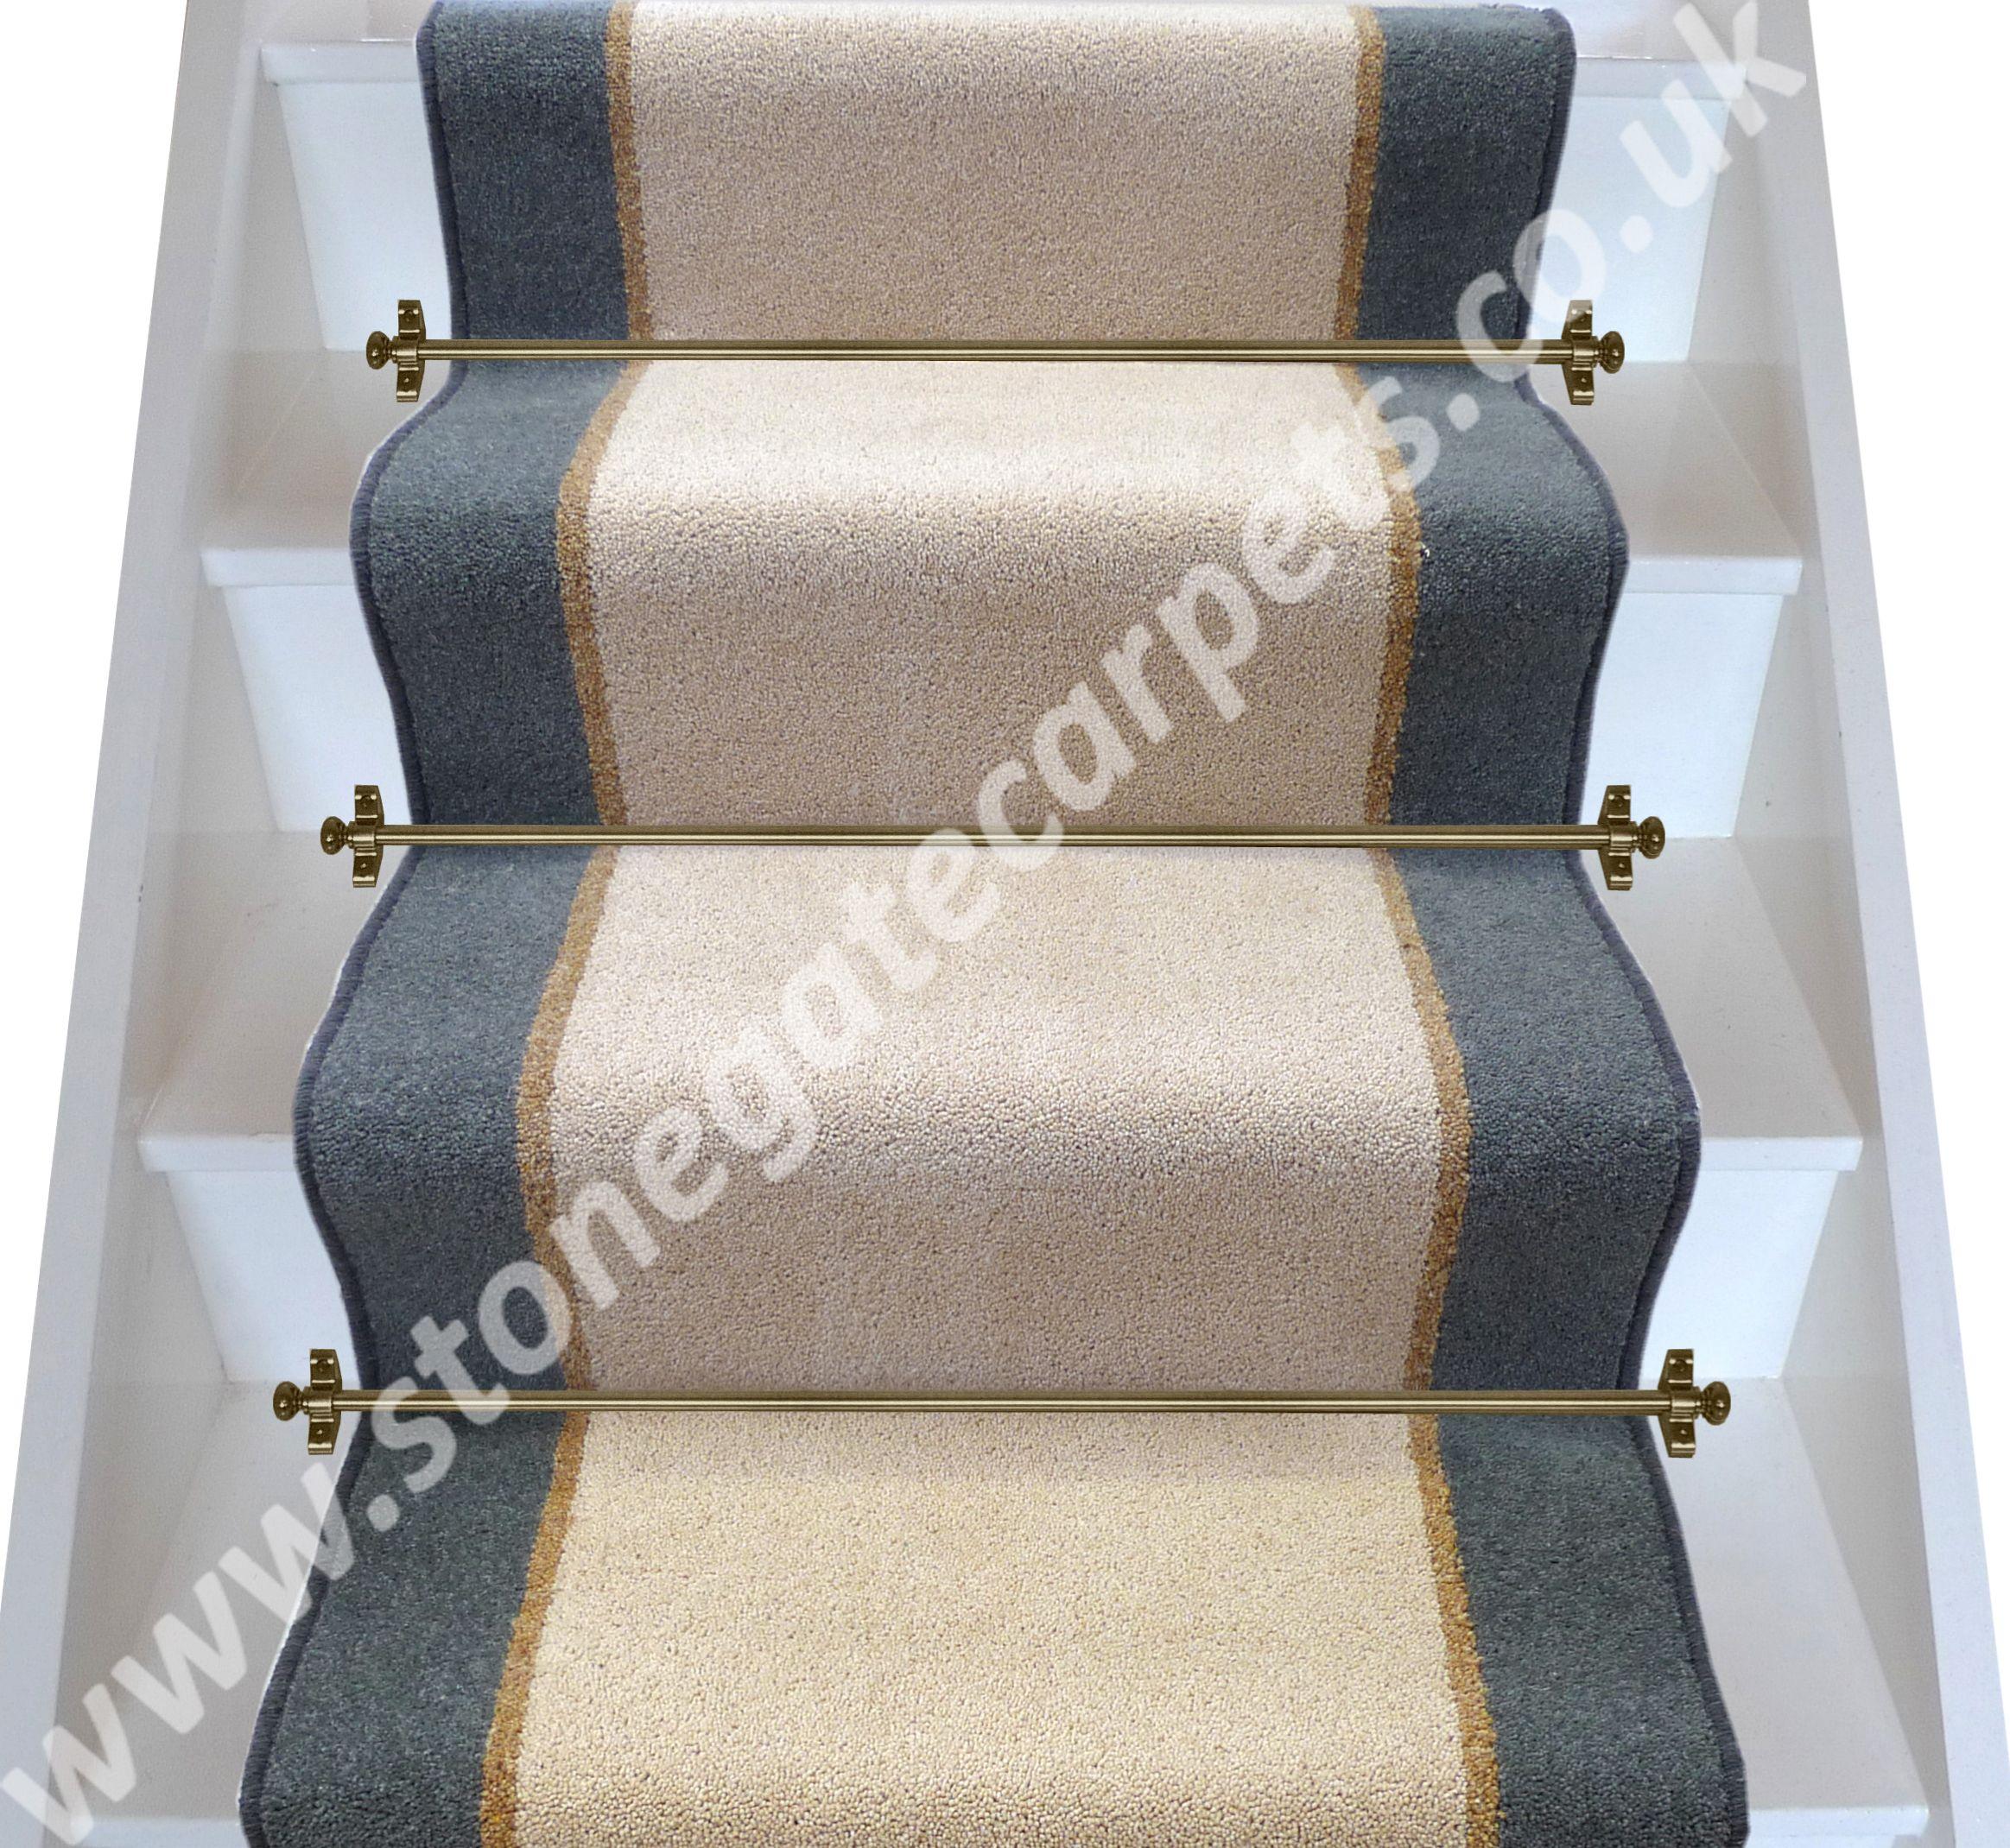 Stair Runner Brintons Moccasin Coffee Smoke Stair Runner Carpet Fitting Beige Carpet